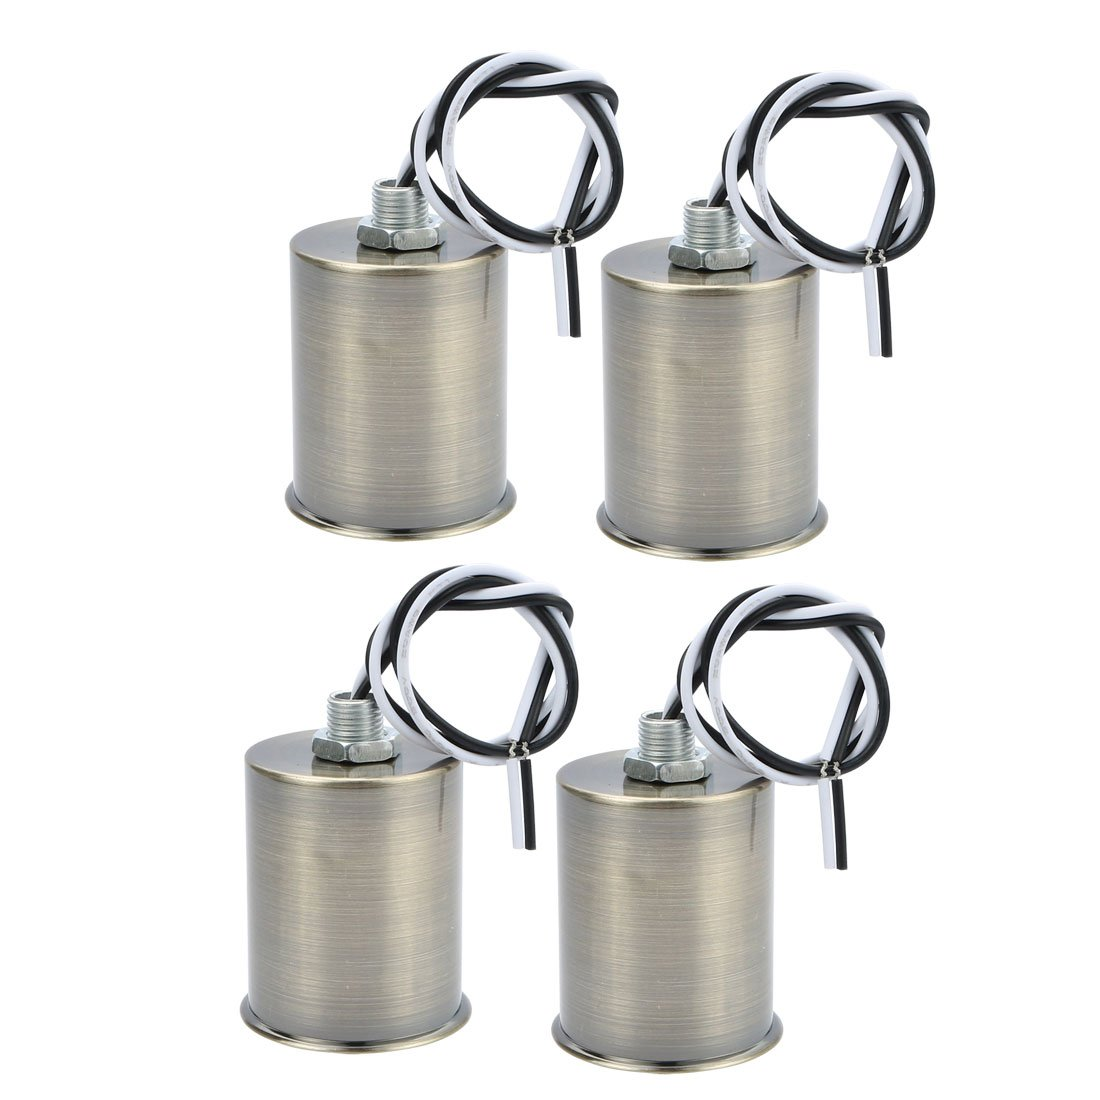 uxcell 4pcs E27 Screw Bulb Base Light Socket Medium Base Porcelain Lamp Holder Bronze Tone